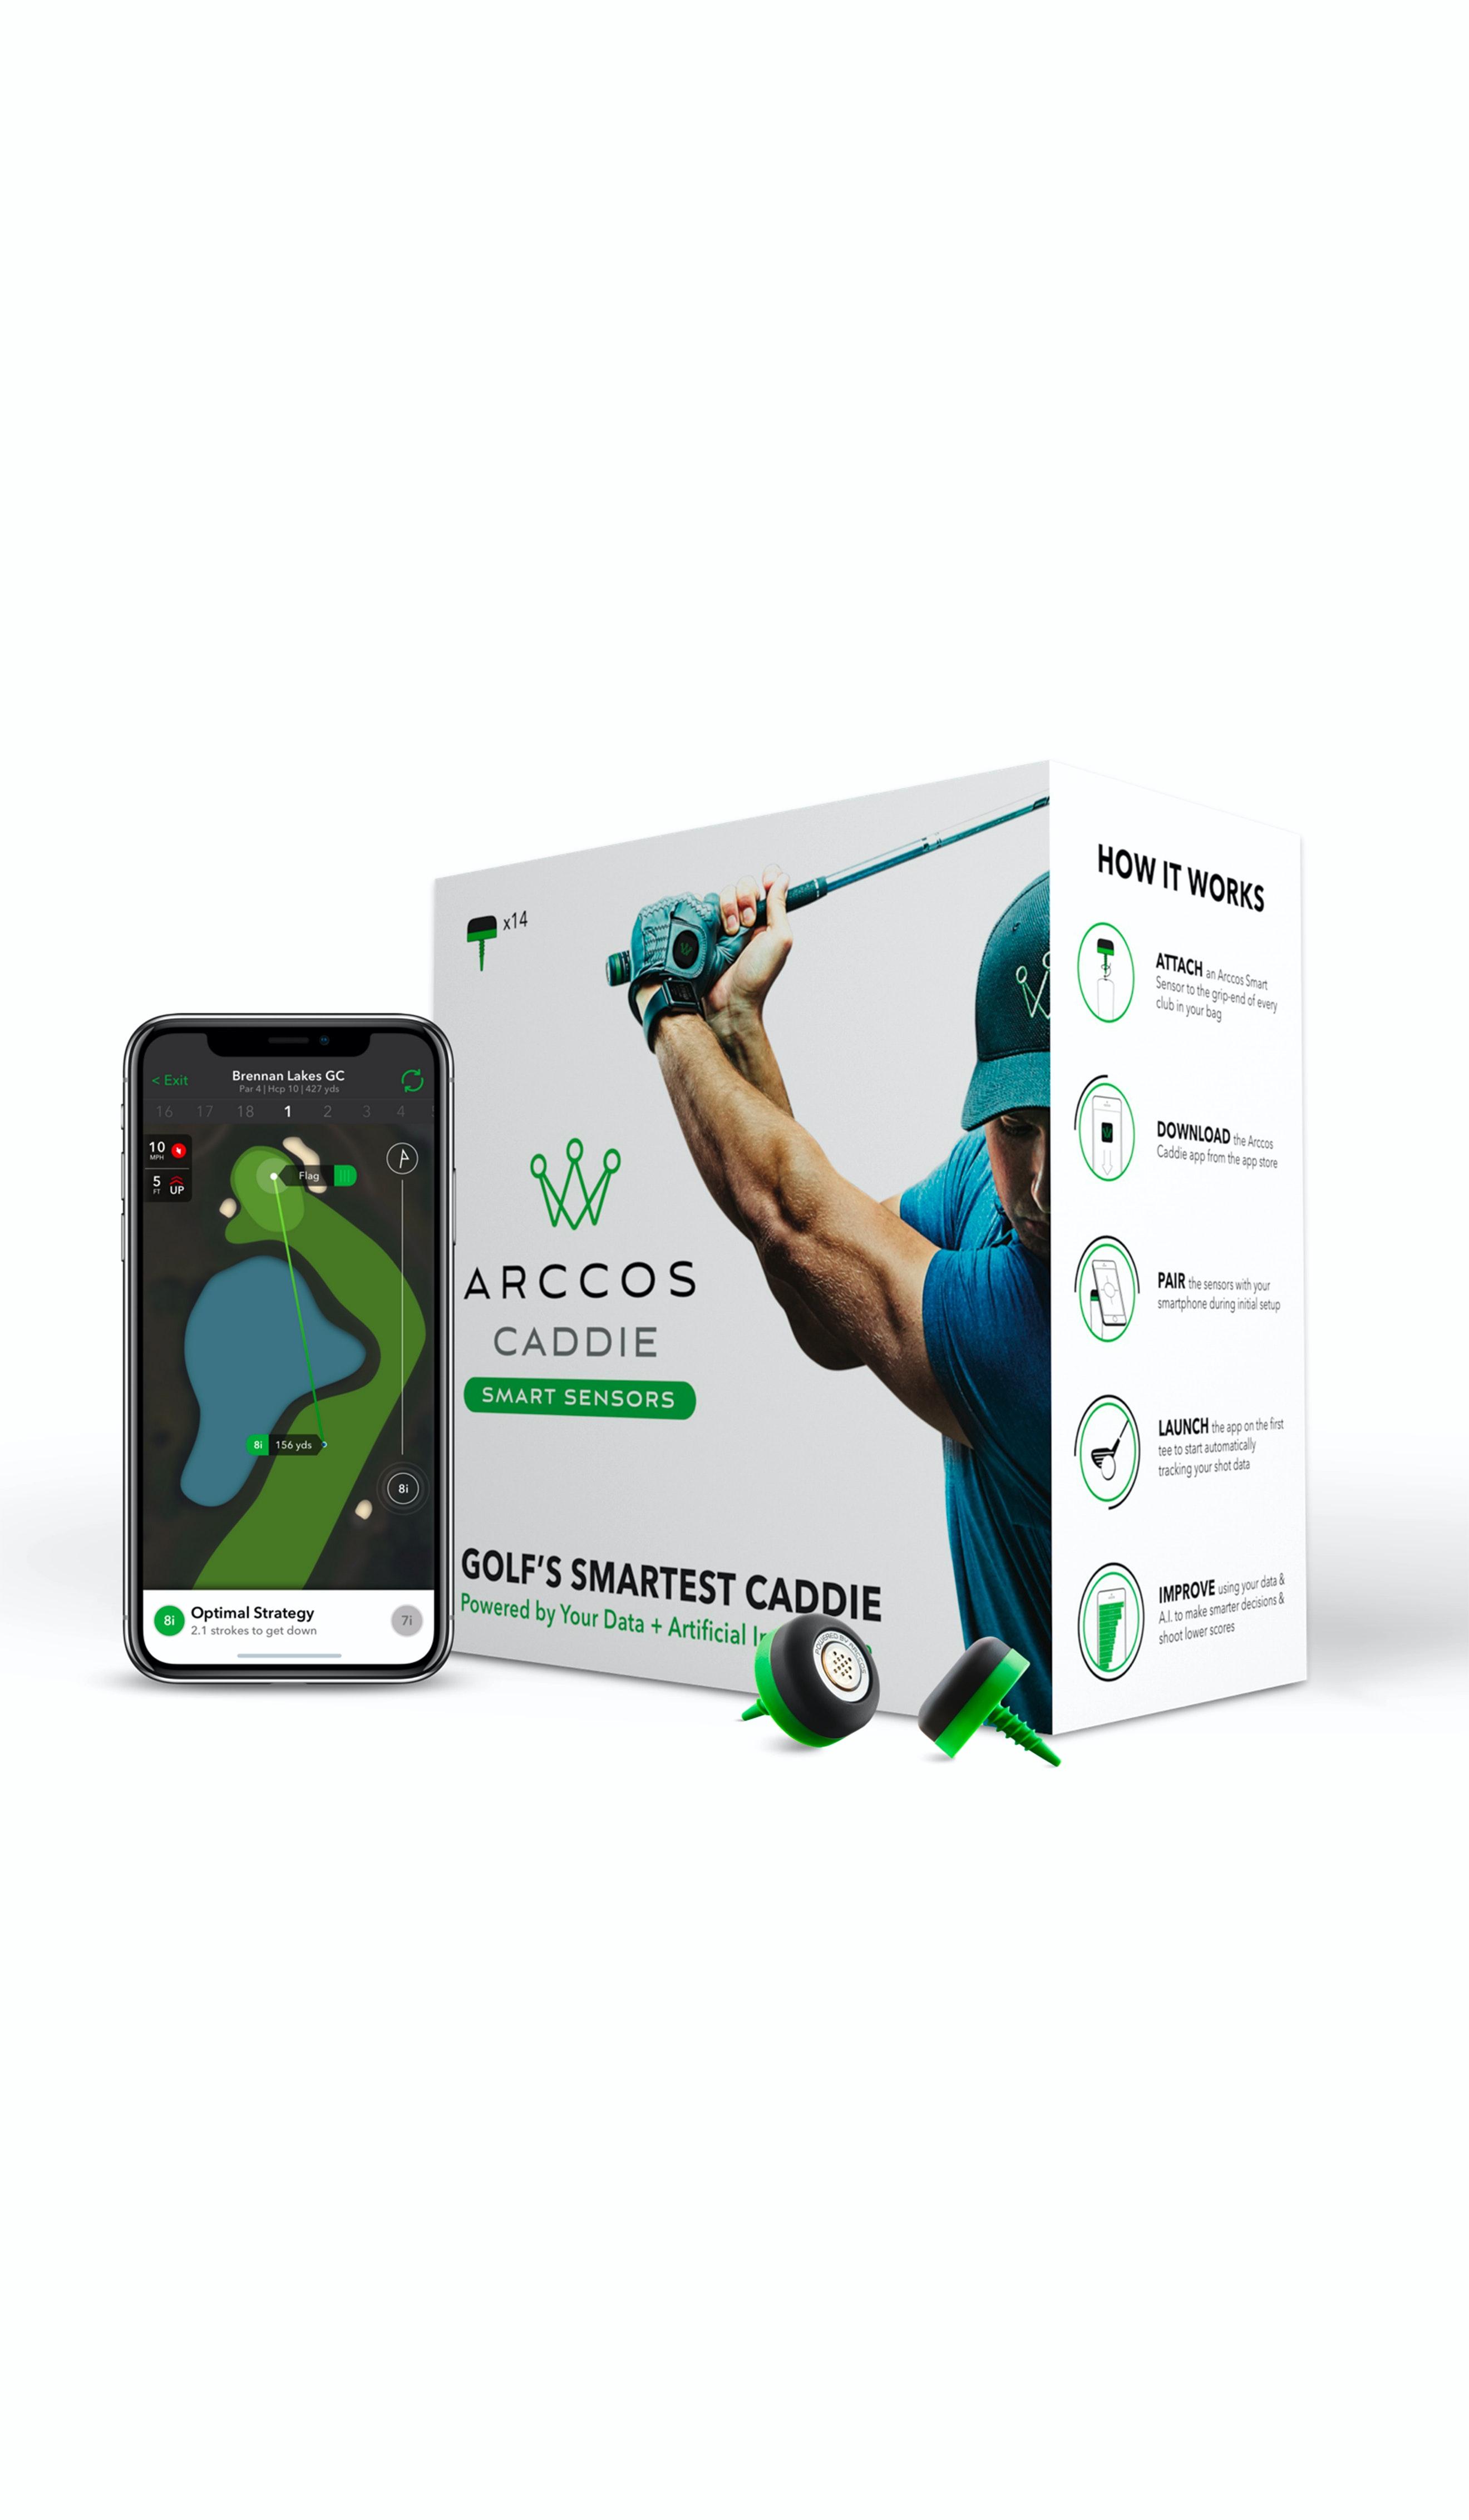 Caddie smart sensors